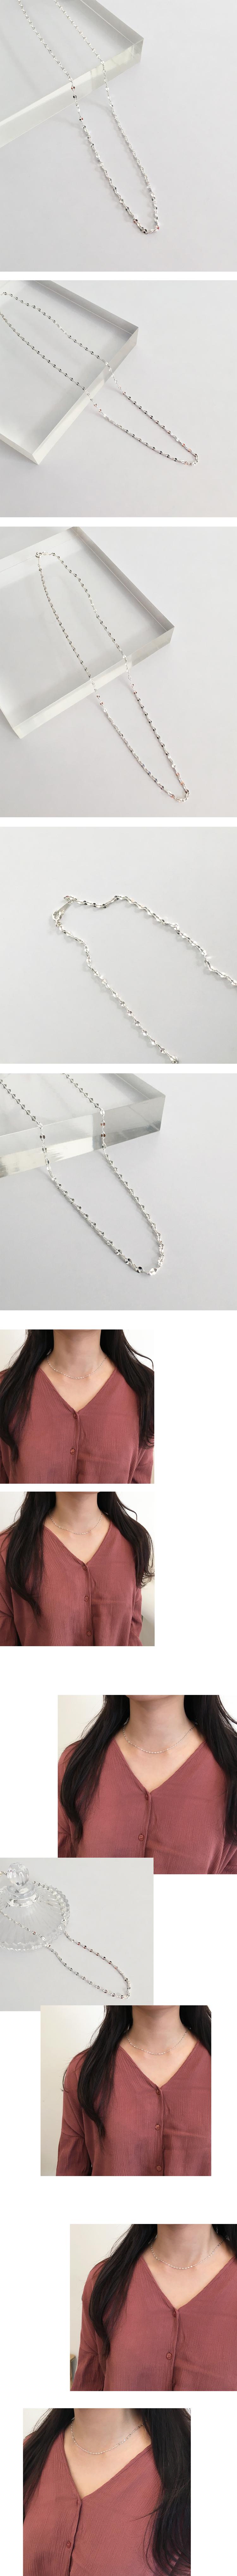 dos necklace